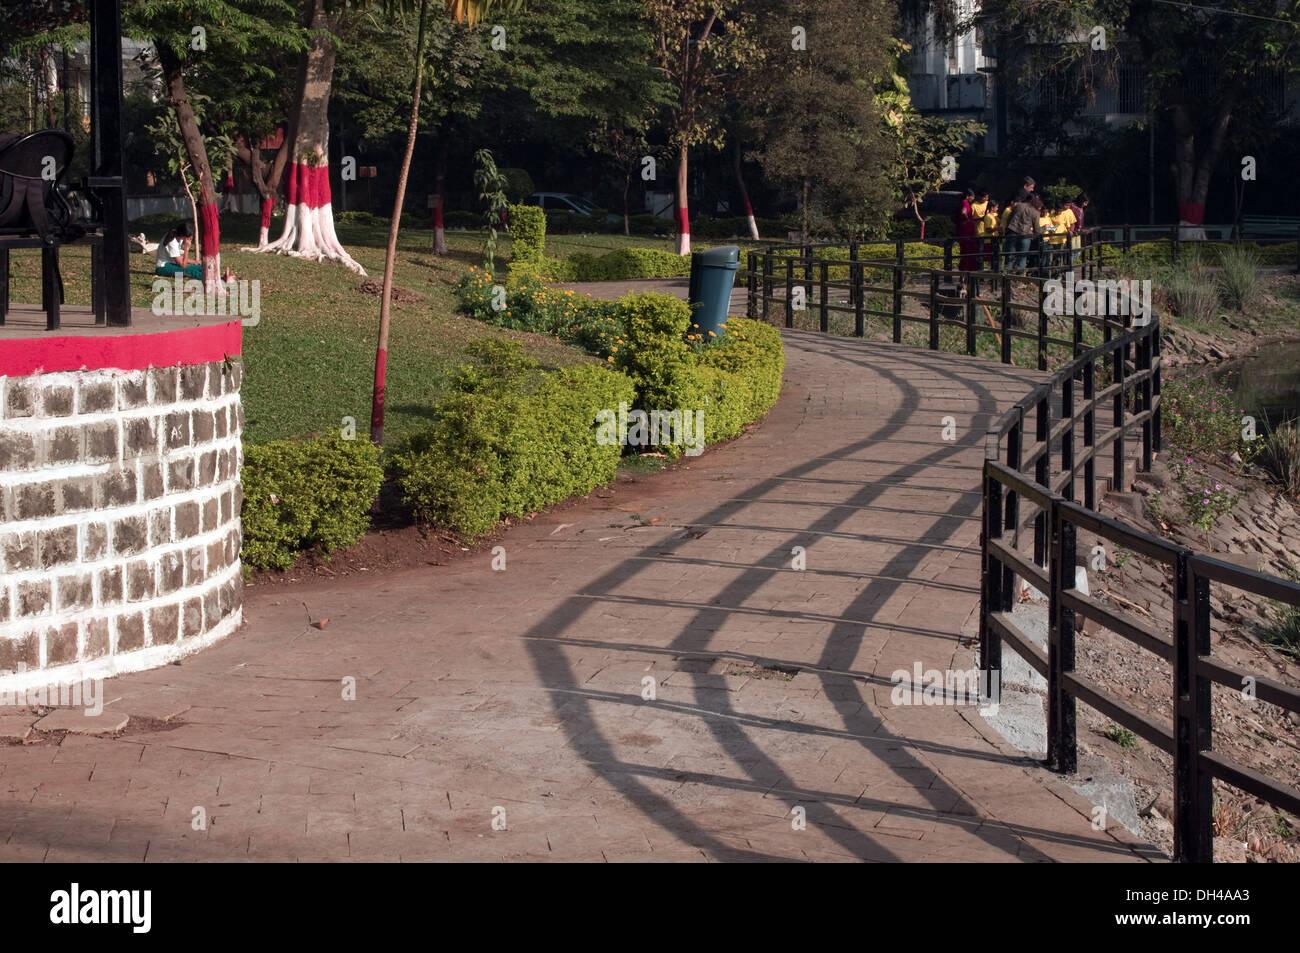 Walking path in garden Pune Maharashtra India Asia Feb 2012 - Stock Image